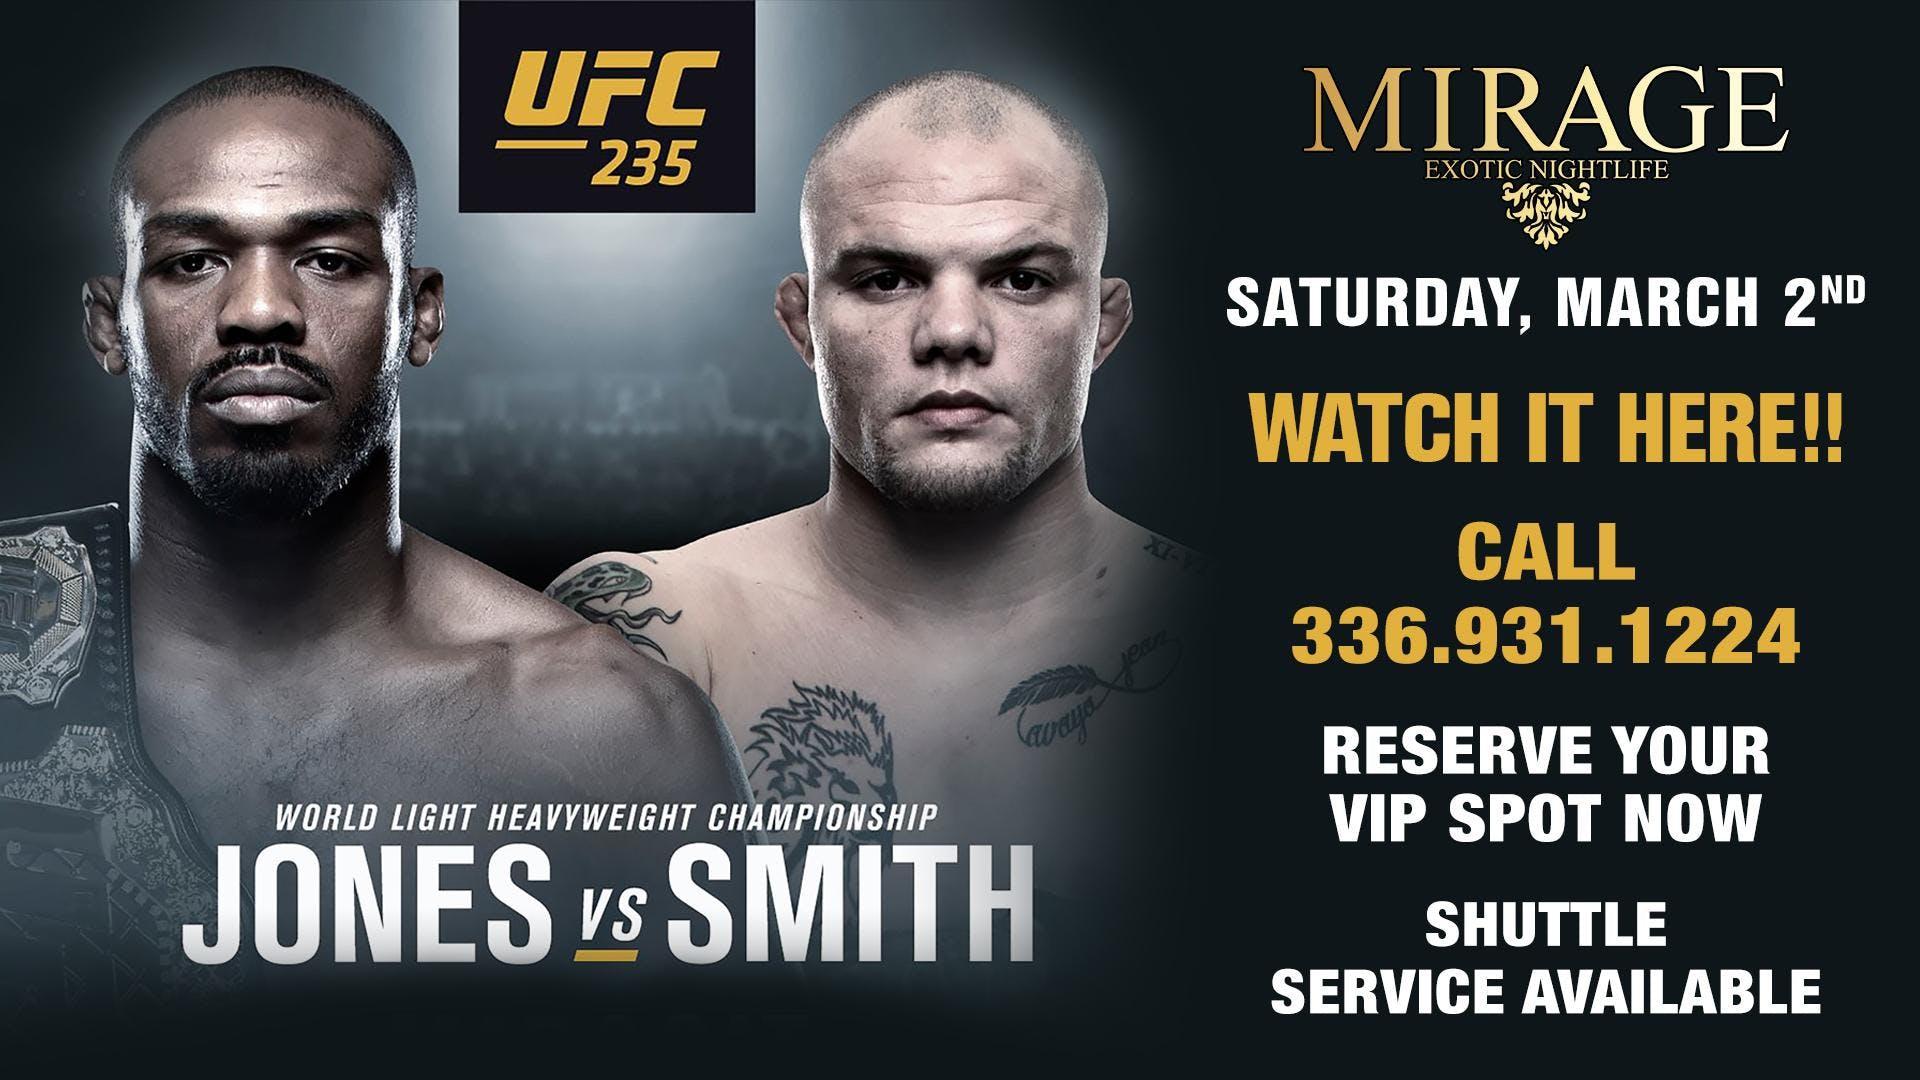 Mirage Exotic Nightlife   UFC 235   Jones Vs Smith   2 MAR 2019 1920x1080